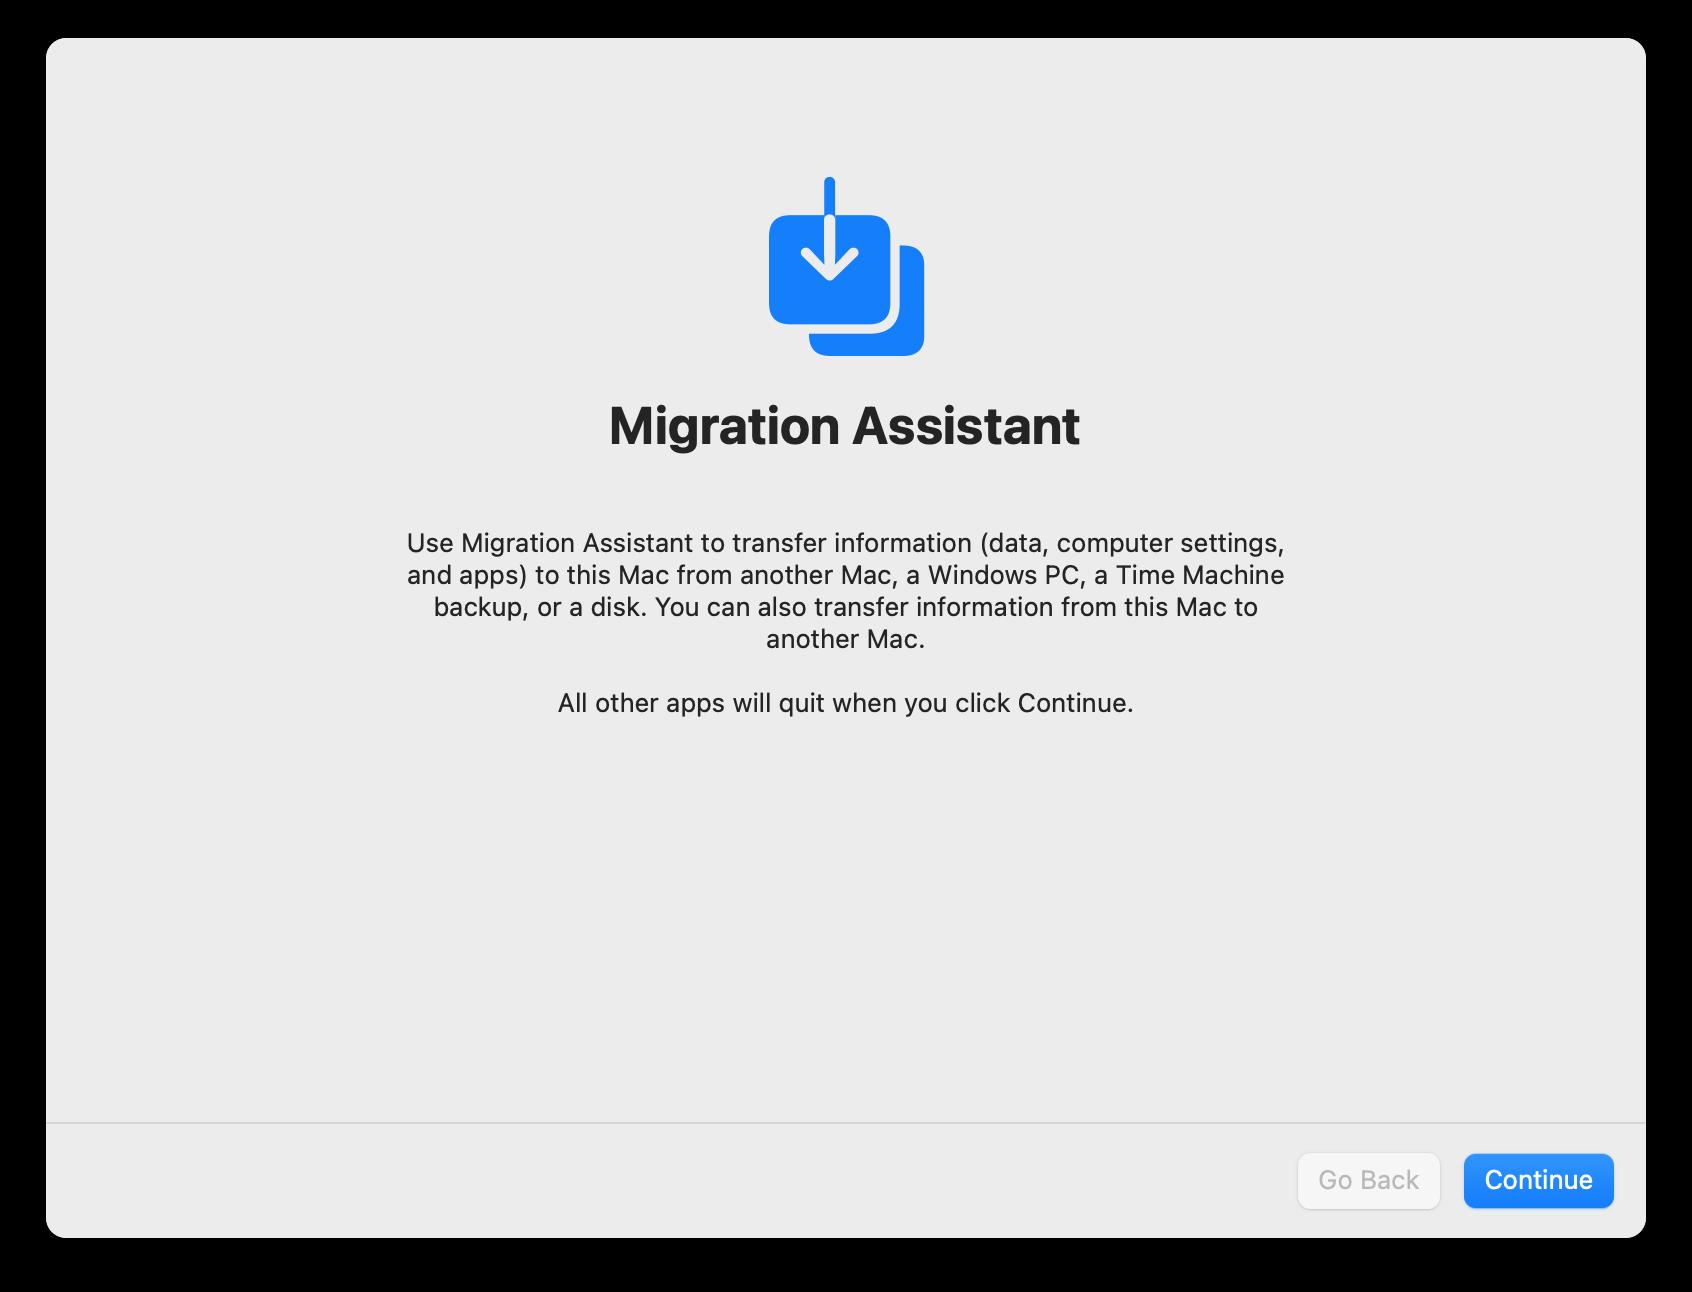 Migration Assistant start window